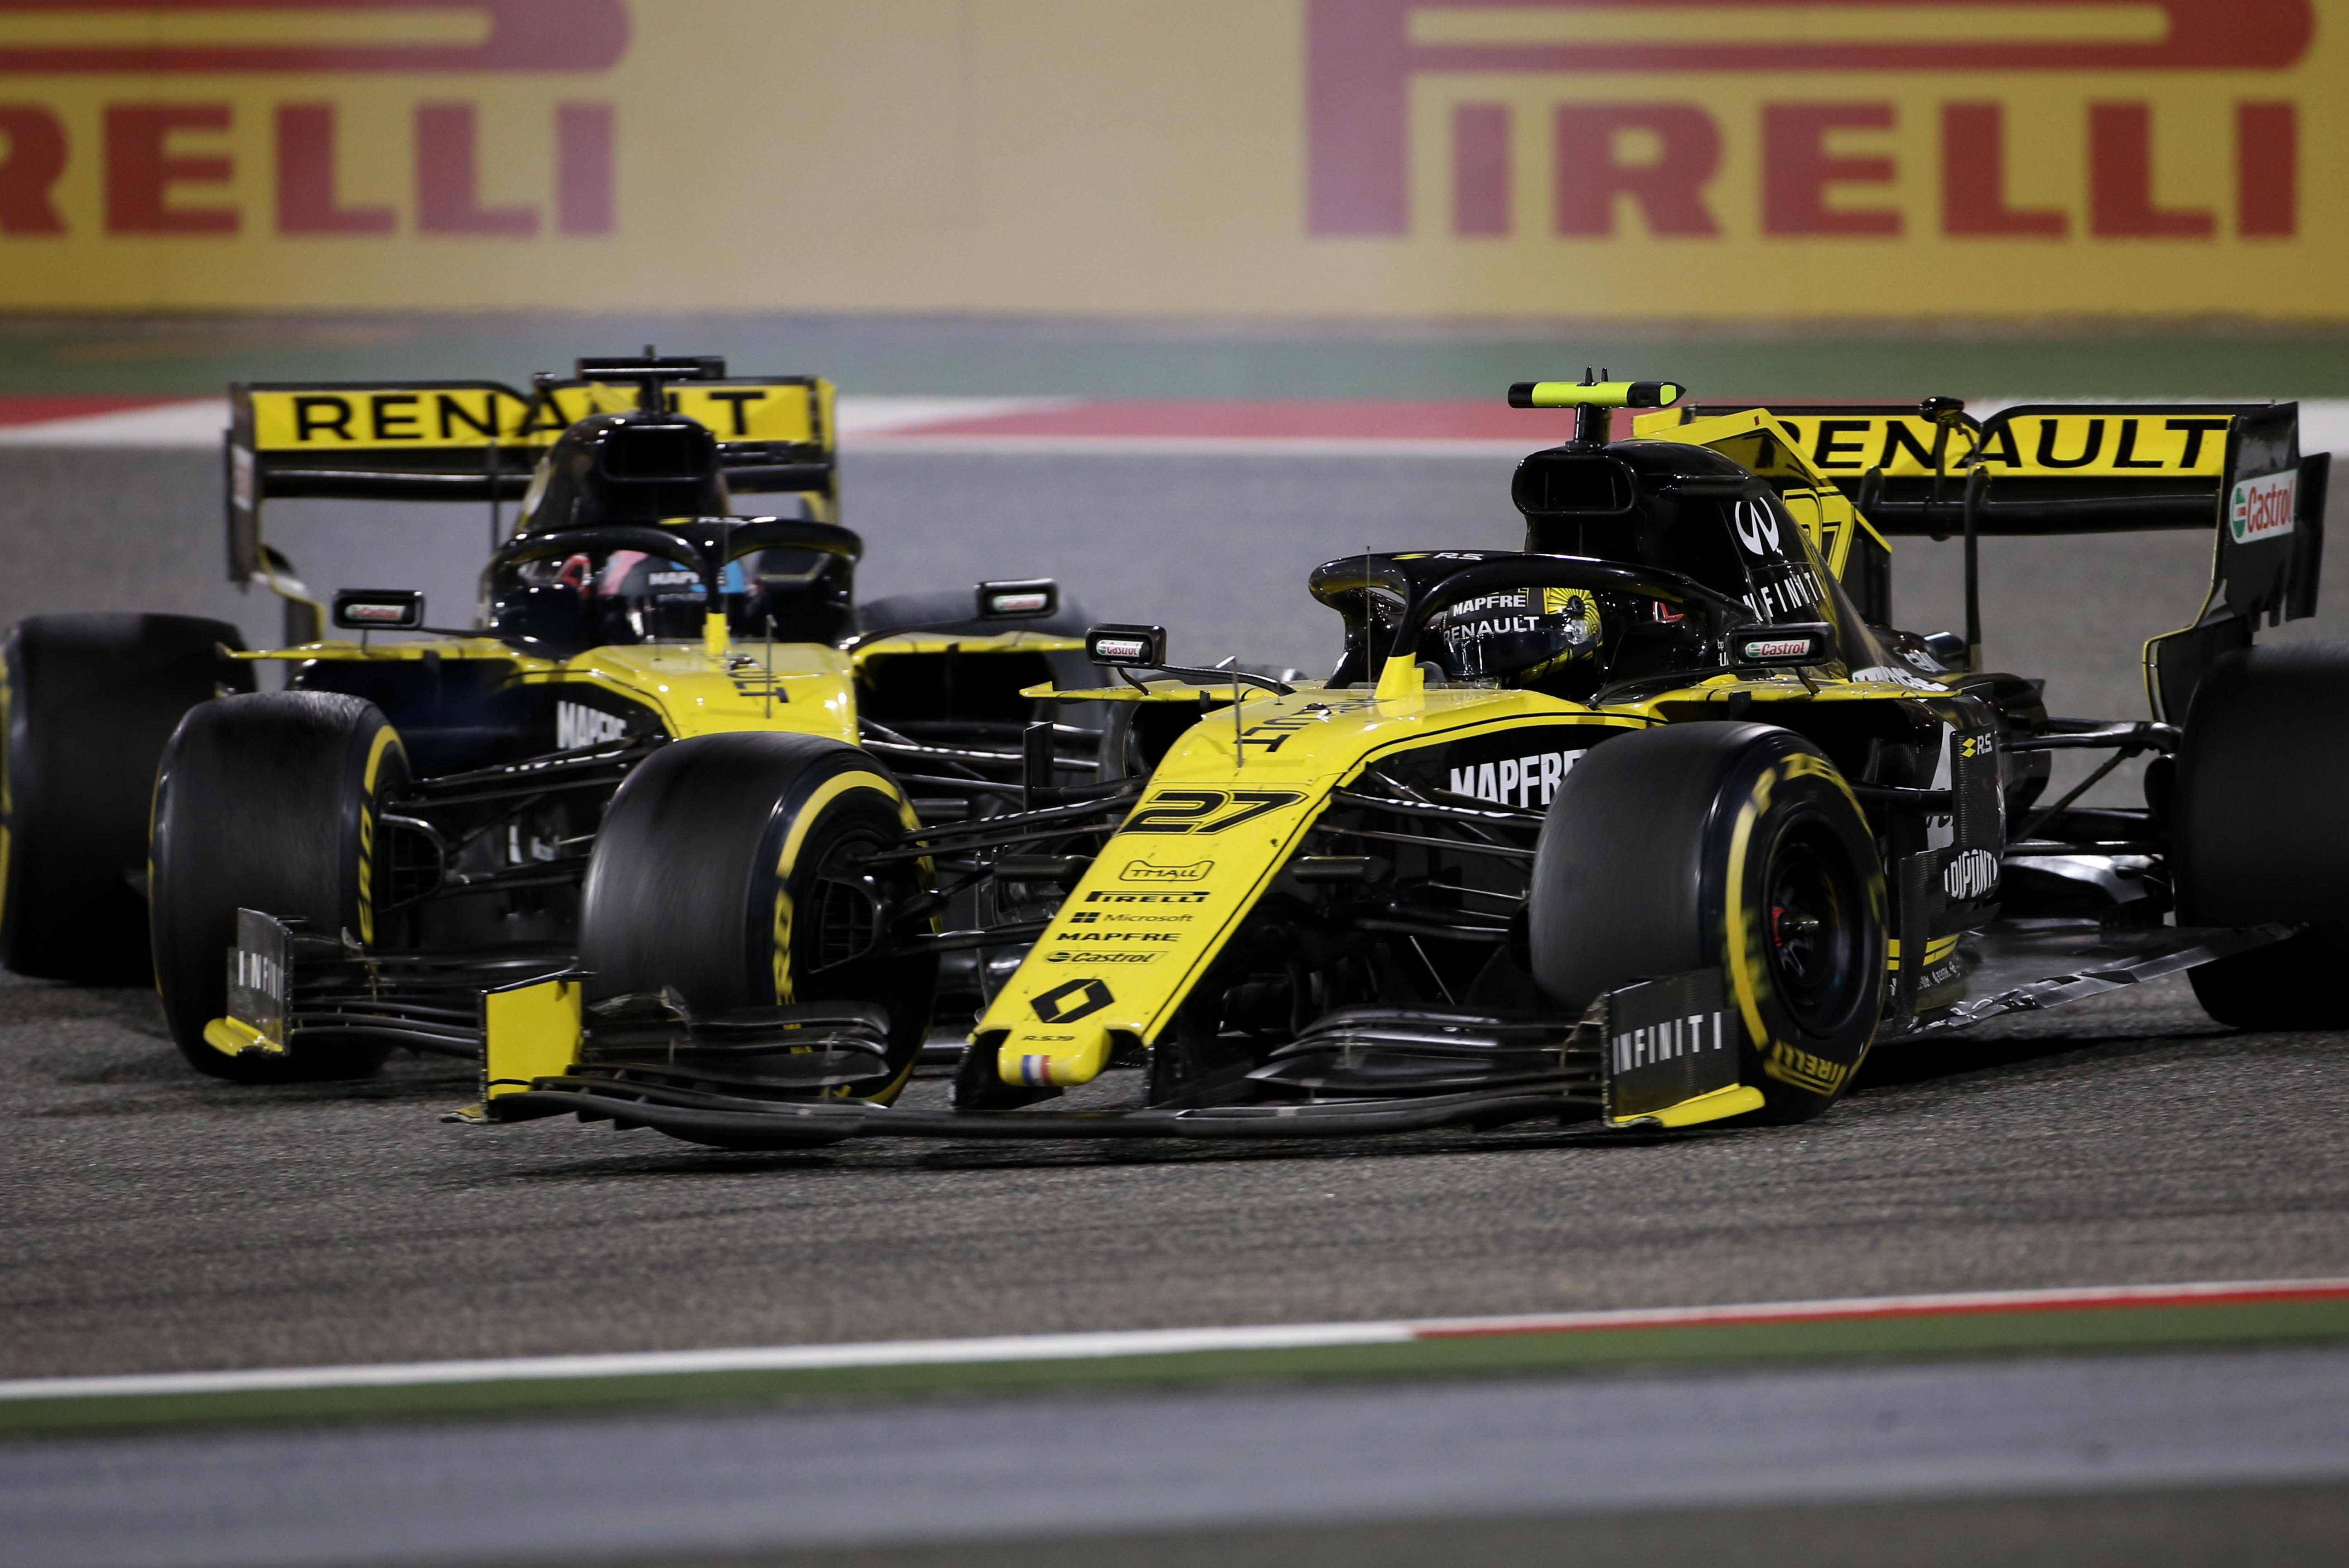 Nico Hulkenberg Daniel Ricciardo Renault Bahrain Grand Prix 2019